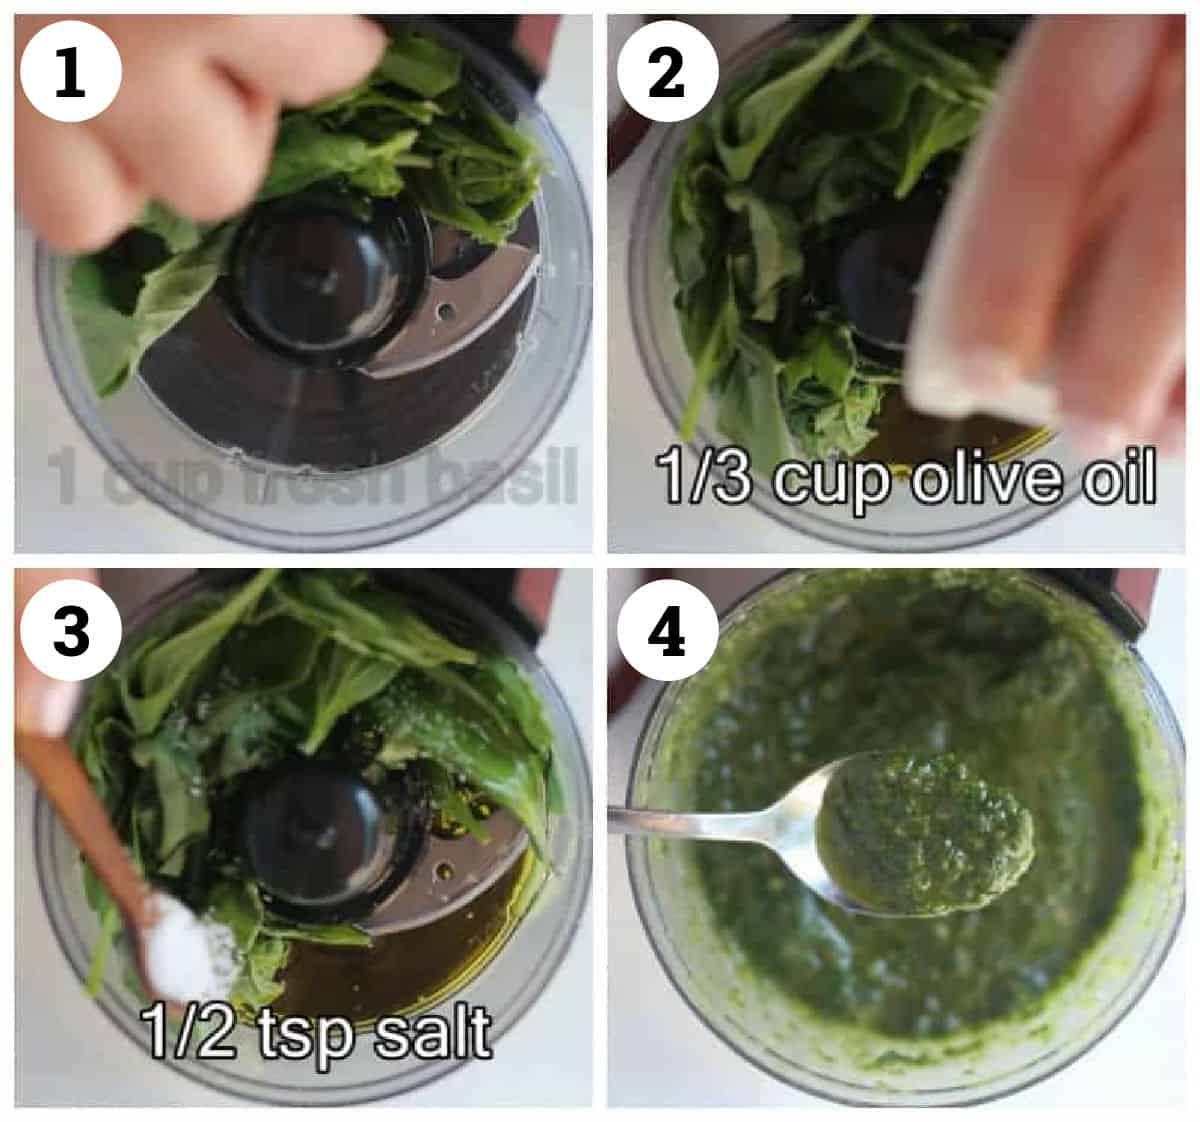 Place basil, olive oil and salt in the blender. Blend until creamy.